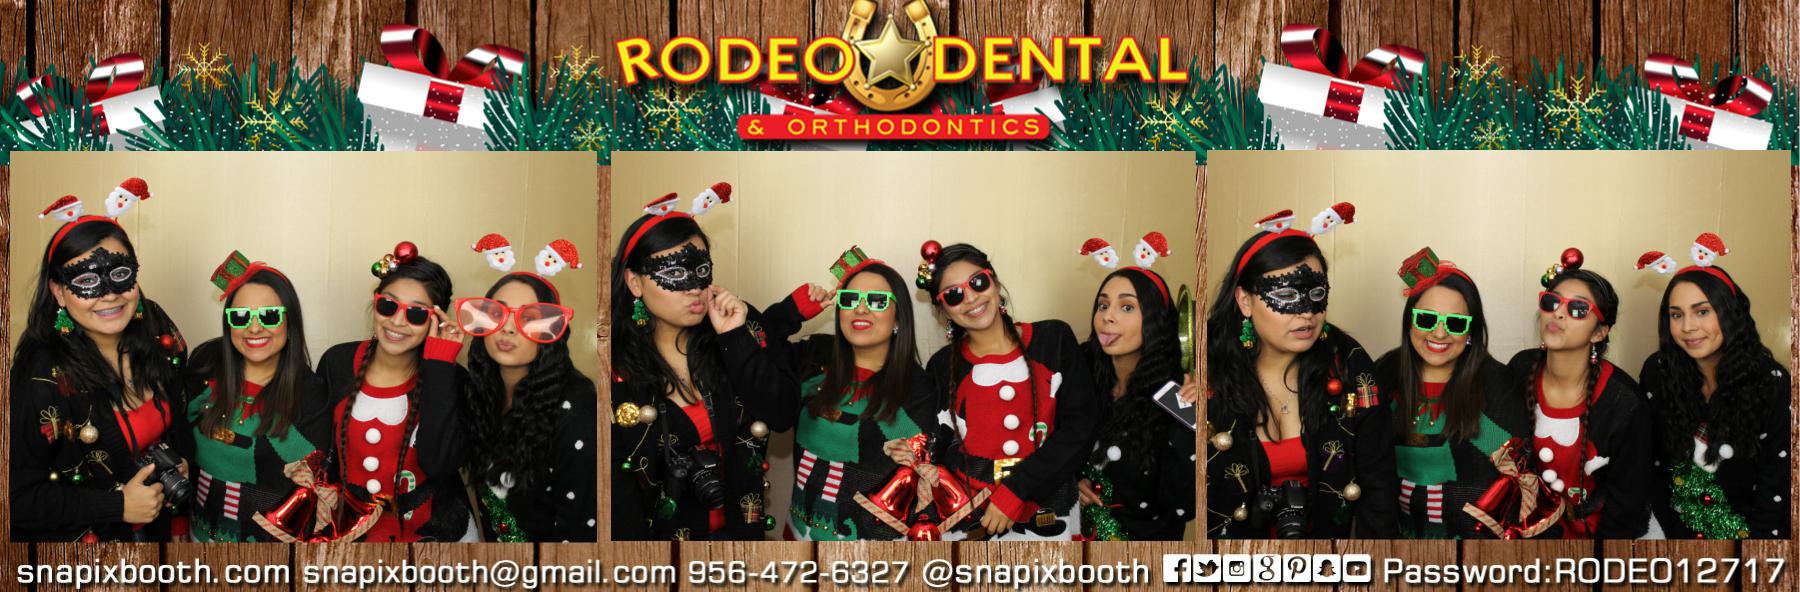 Rodeo Dental Xmas Party